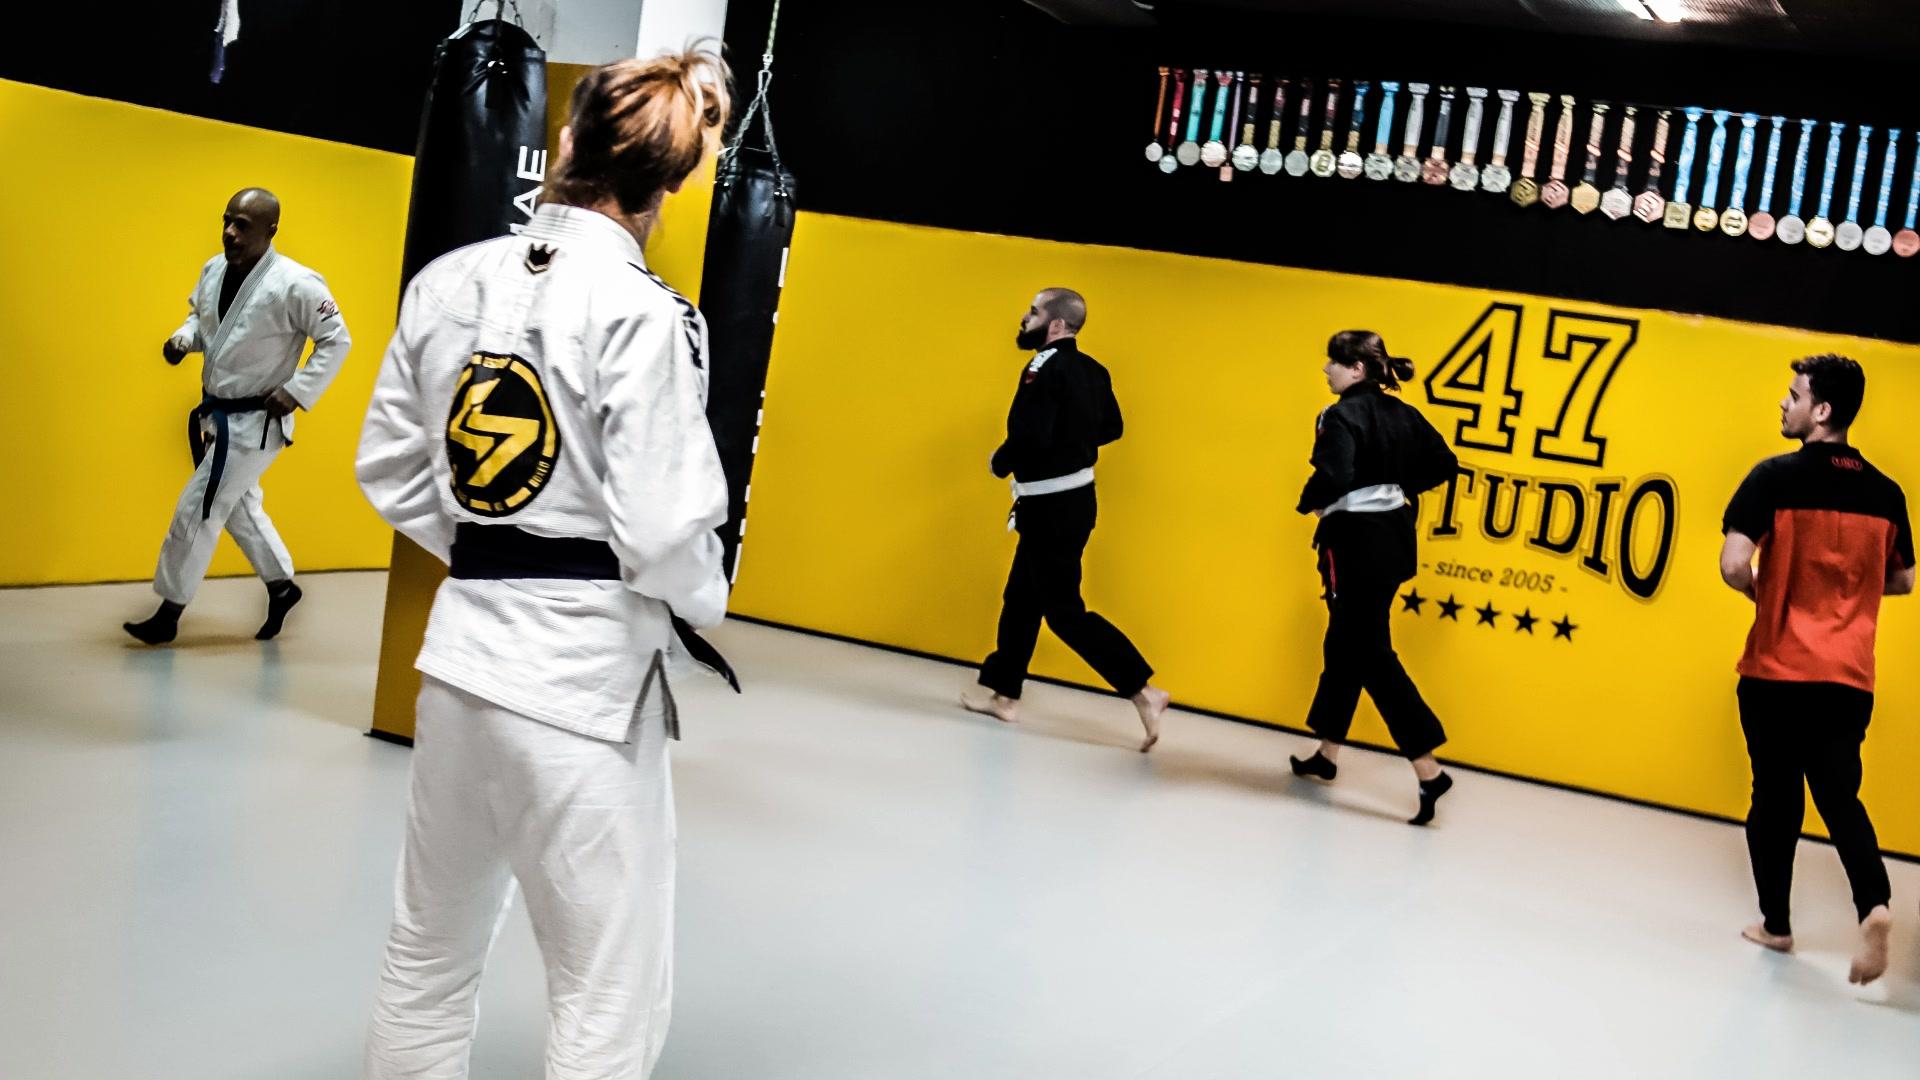 Jiu Jitsu Madrid